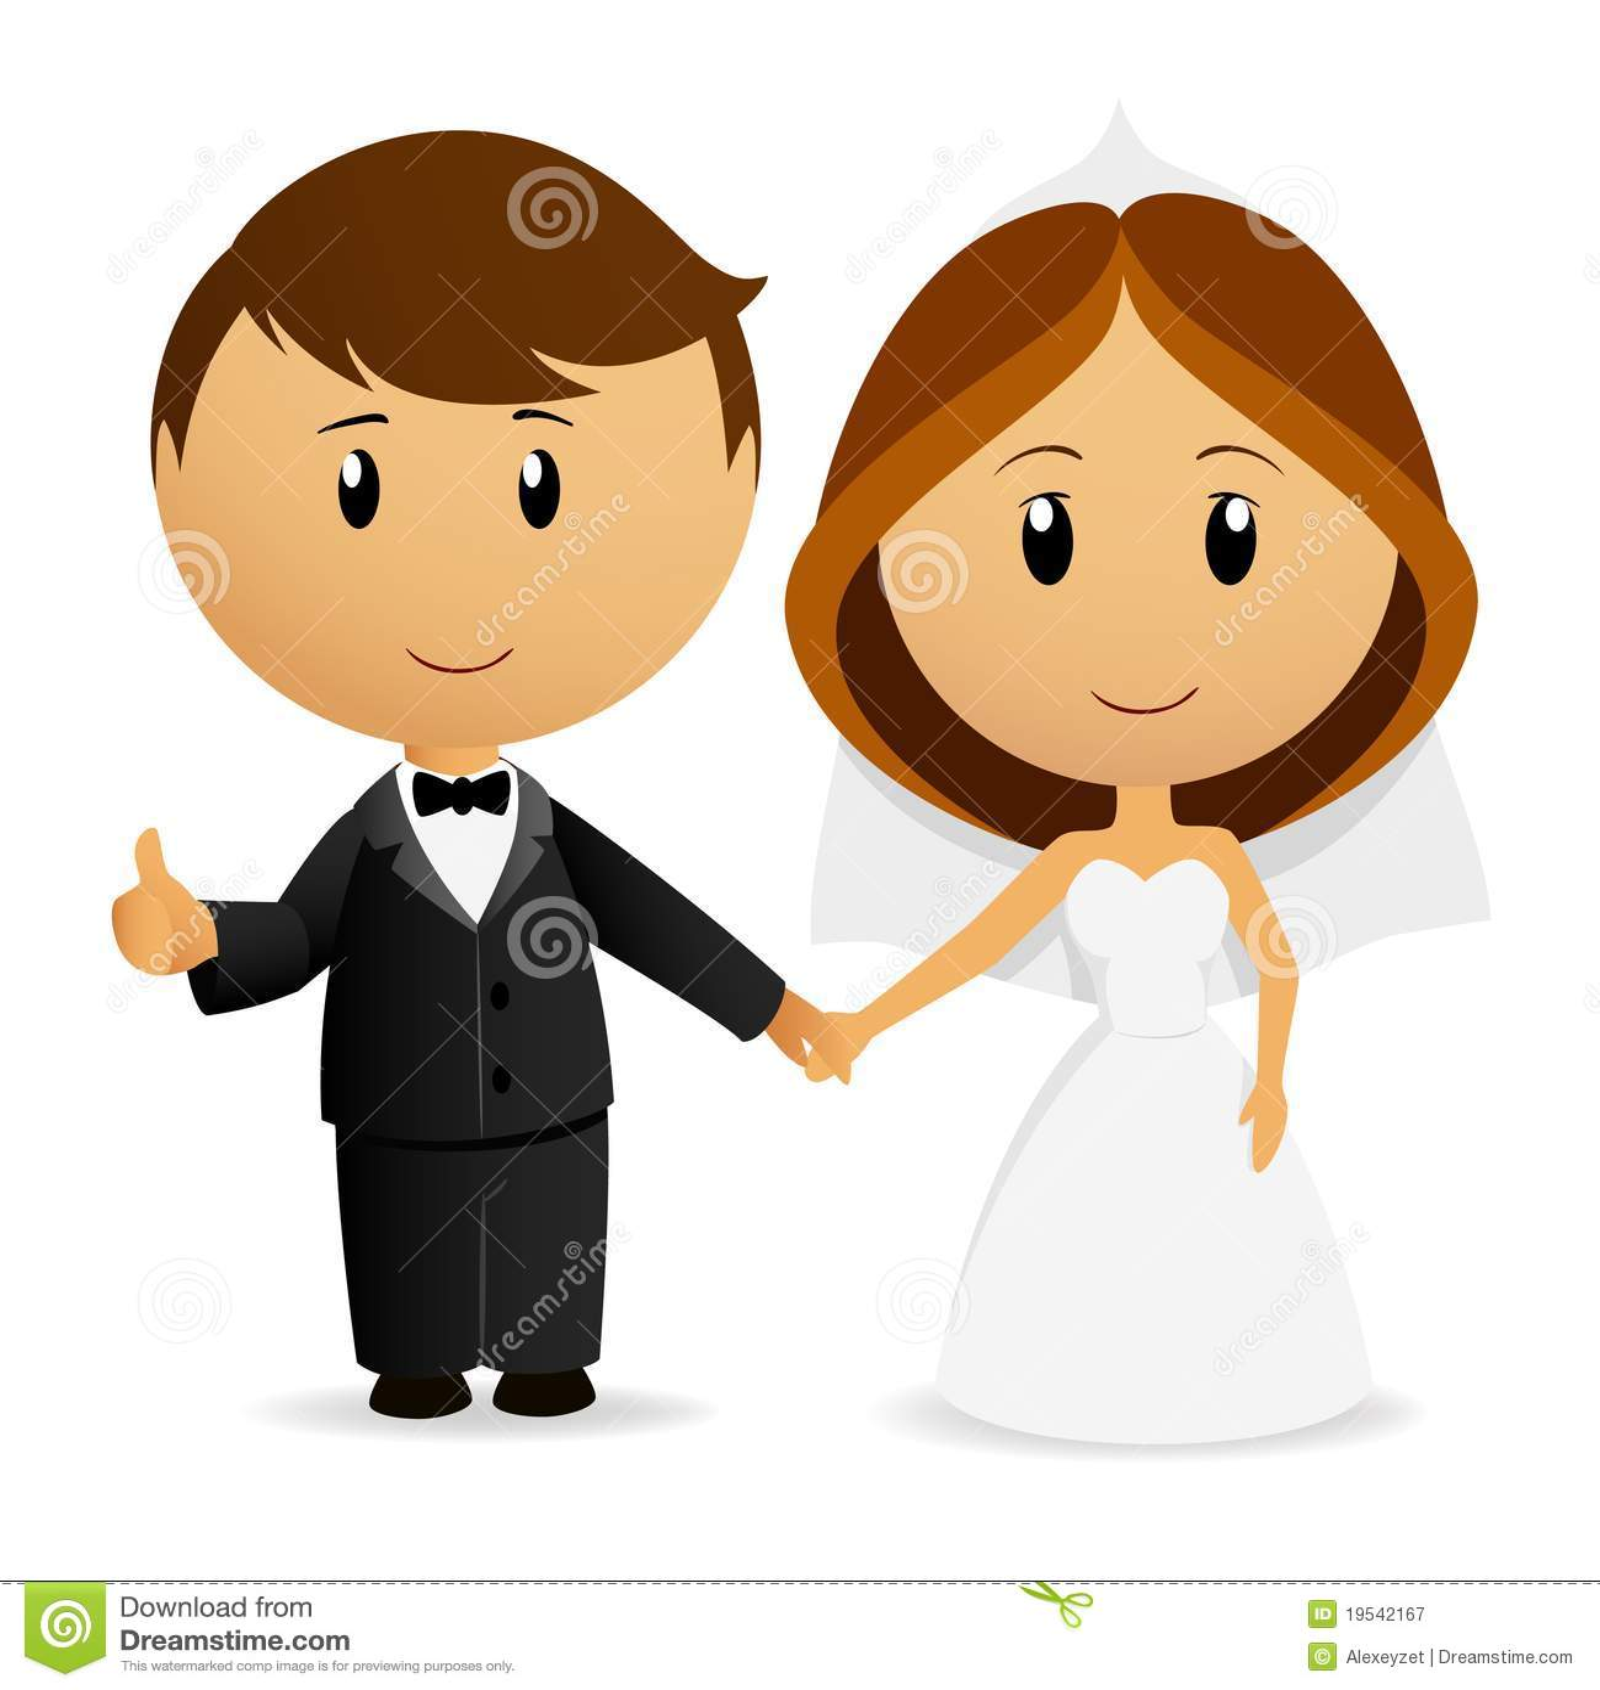 Cute Cartoon Wedding Couple Royalty Free Stock Photography